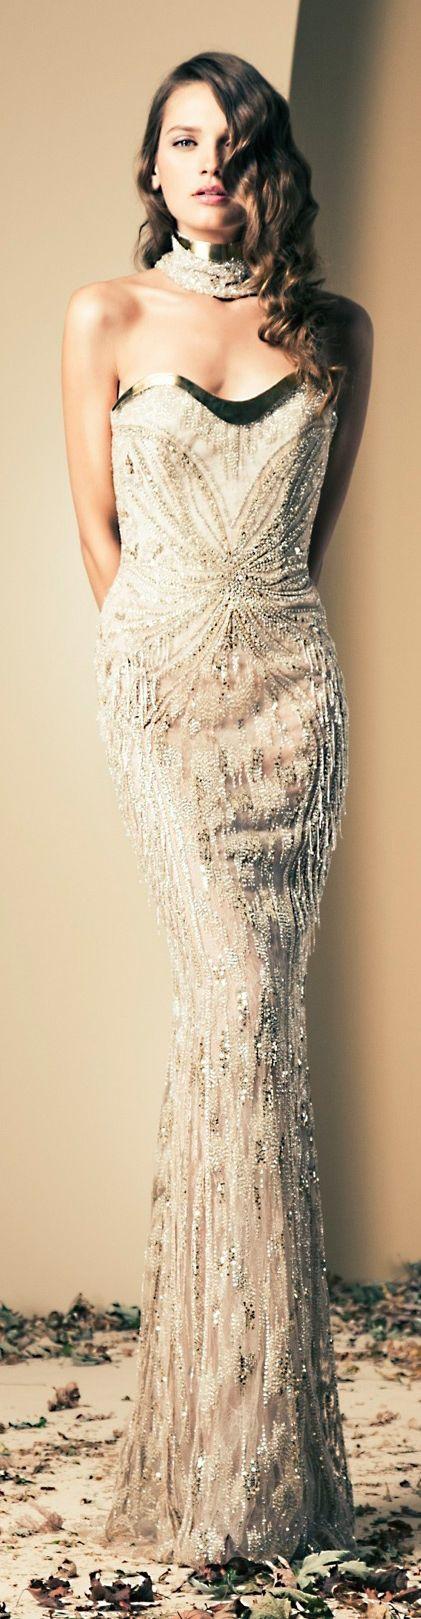 Ziad Nakad Couture F/W 2014 Seguici su Hermans Style diventa nostra fan ed entrerai nel mondo fantastico del Glamour !!!  Shoe shoes scarpe bags bag borse fashion chic luxury street style moda donna moda uomo wedding planner  hair man Hair woman  outfit time watch nail  print photo foto fotografia cartoline Photography